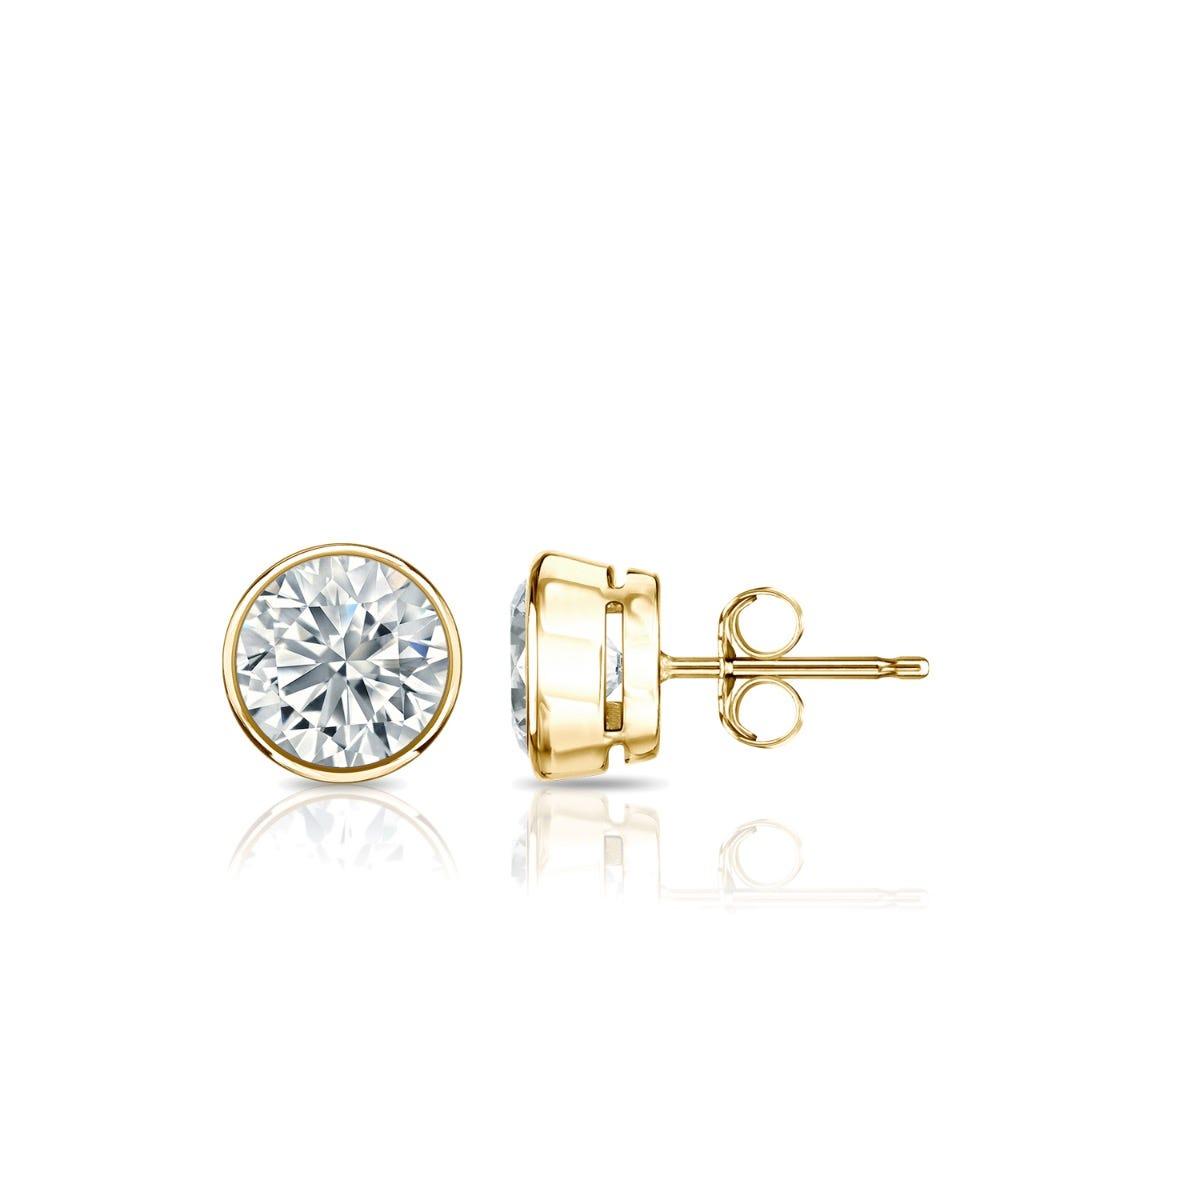 Diamond Round Bezel-Set 5/8ctw. Solitaire Stud (IJ-I1) Earrings in 14K Yellow Gold